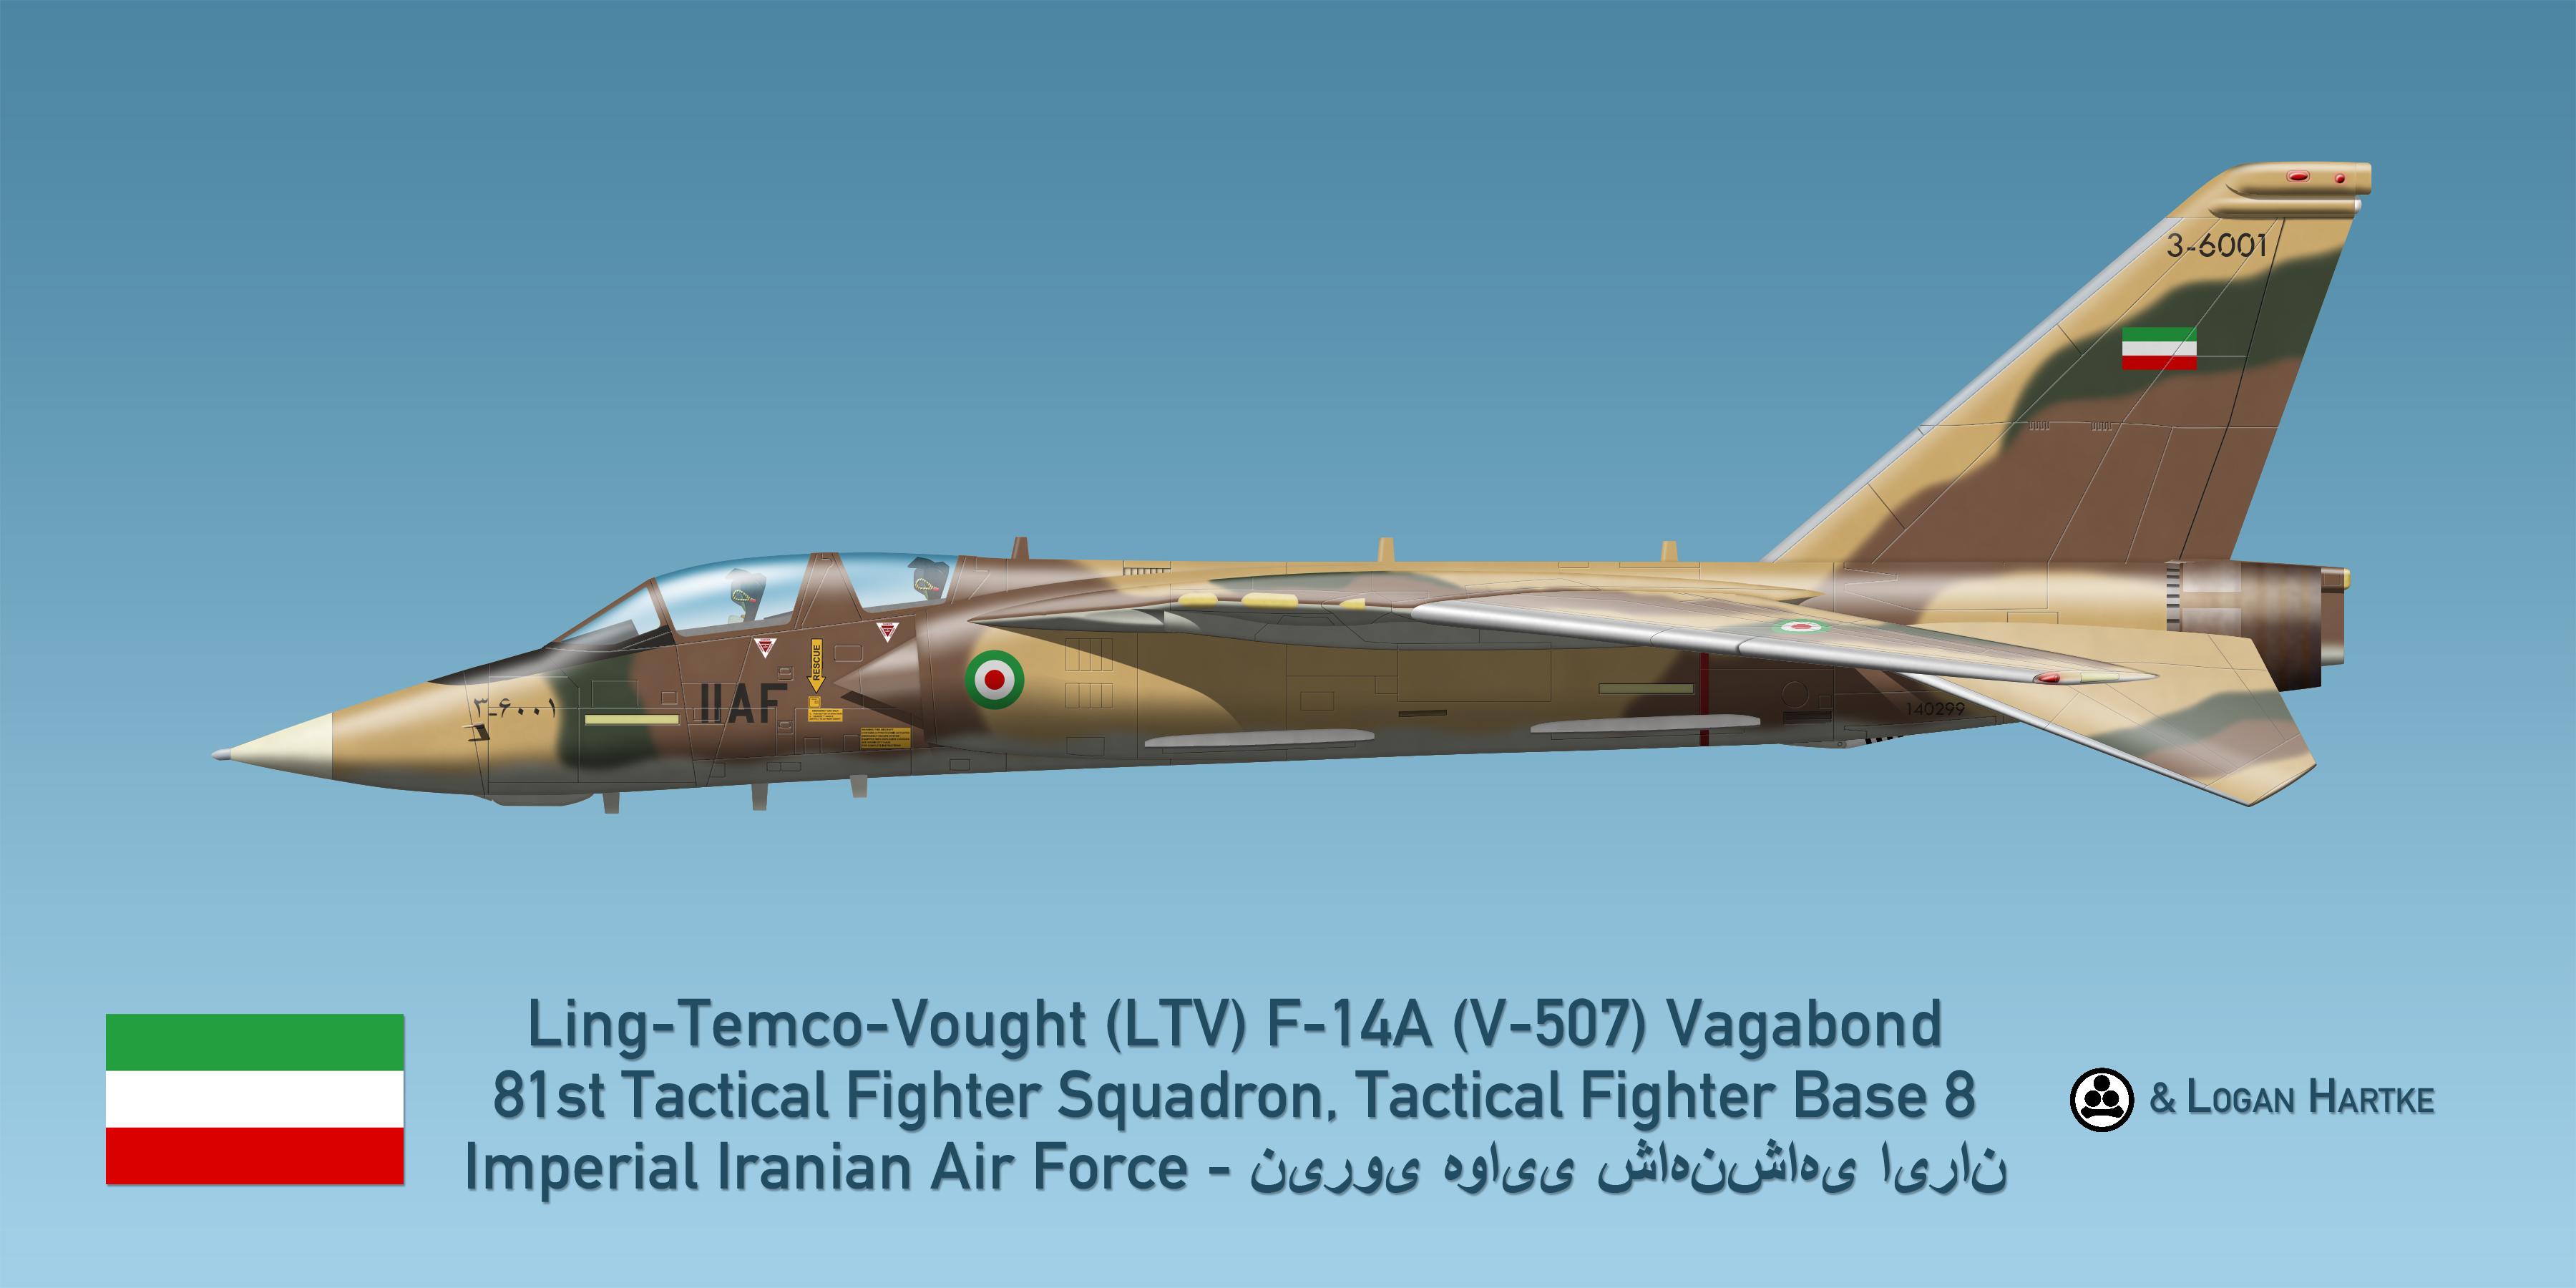 Vought V-507 F-14A Vagabond - Iran